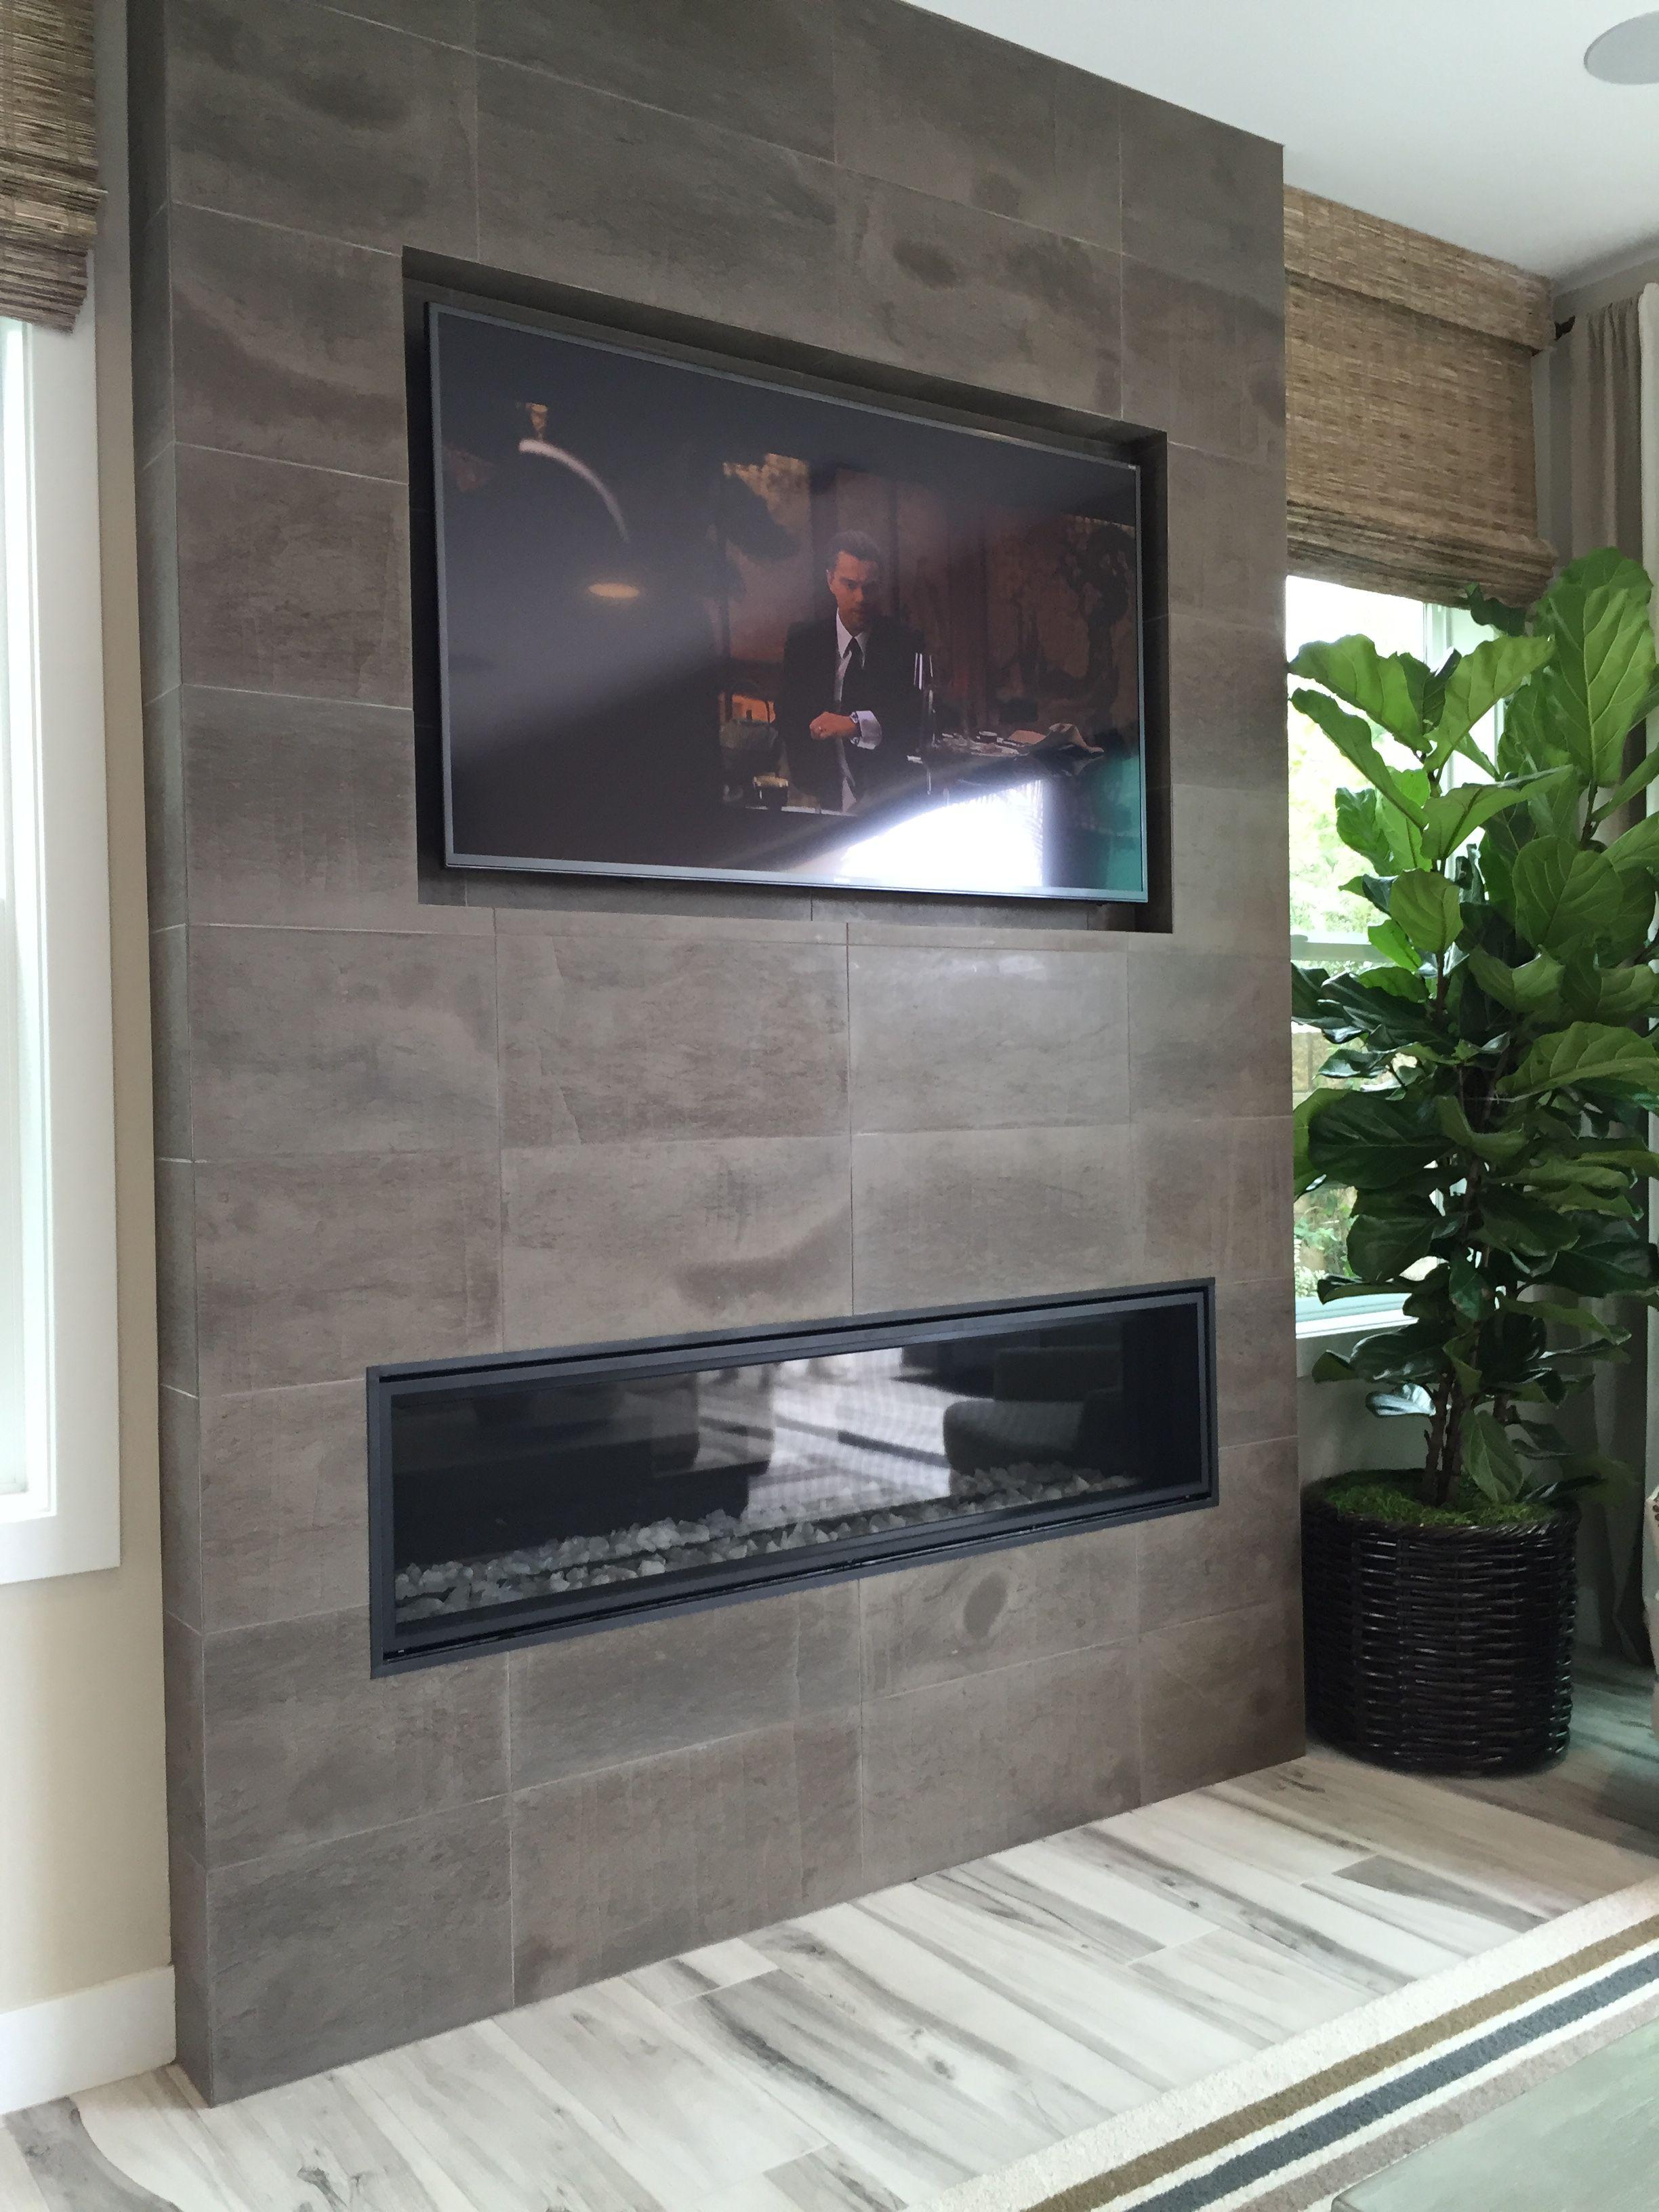 Tiles Design For Living Room Wall: Pin On Living Room TV Wall